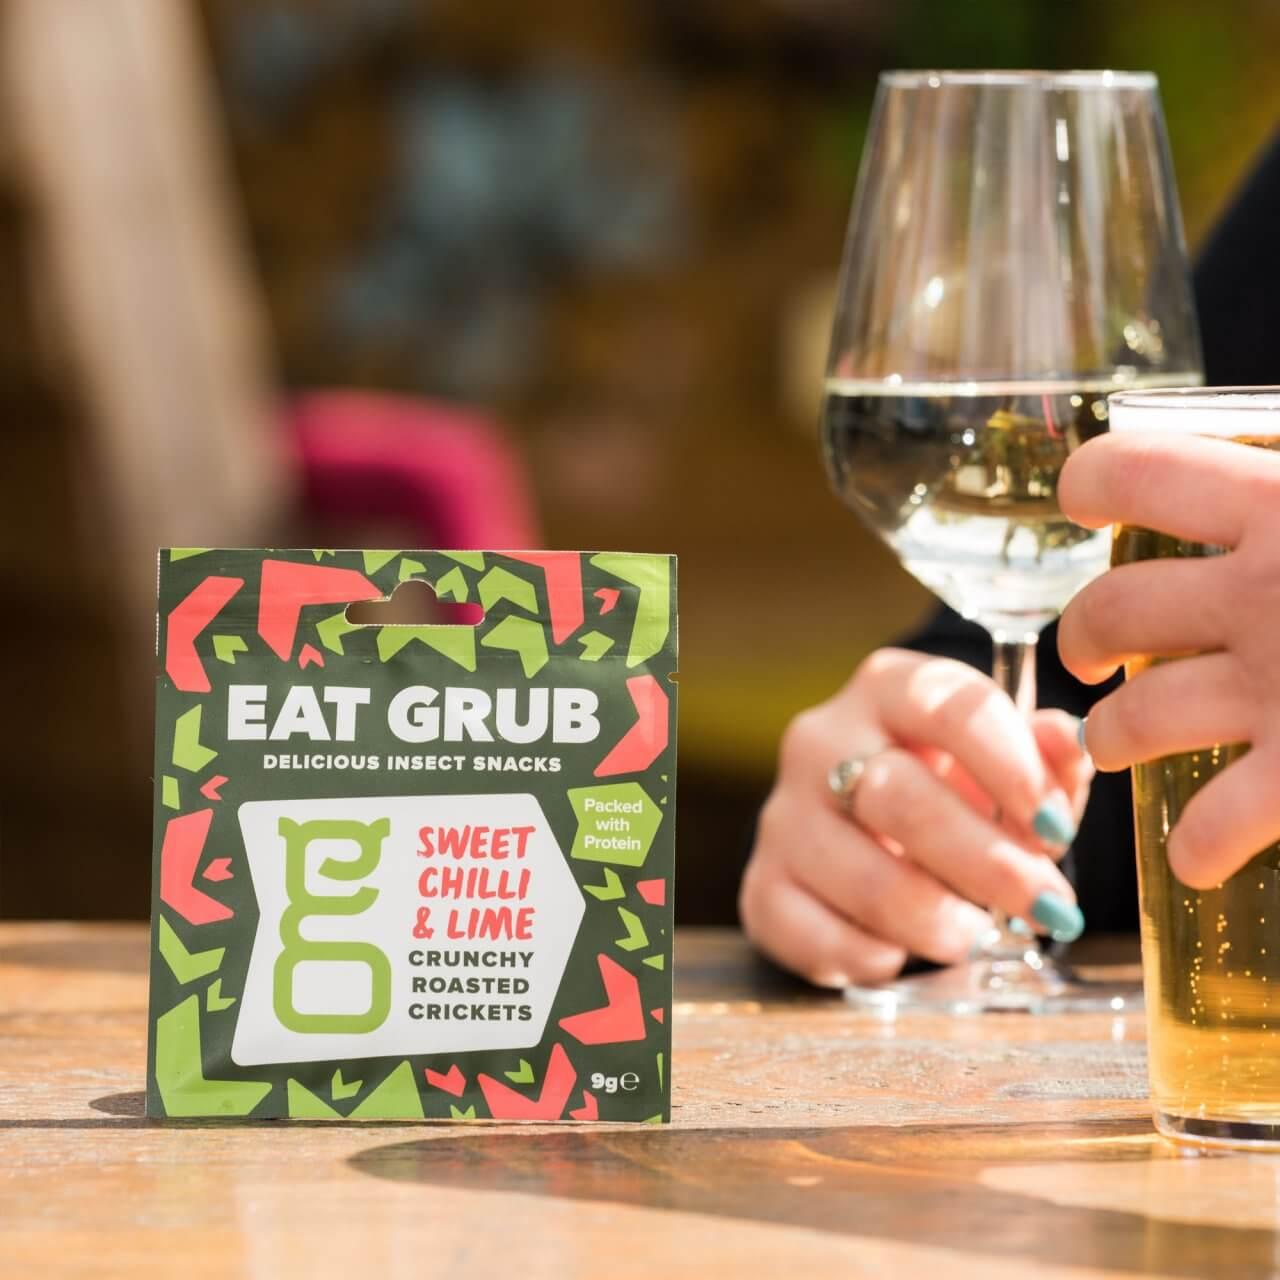 Eat Grub クランキー ロースト クリケット スイートチリ&ライム 1ケース12袋入